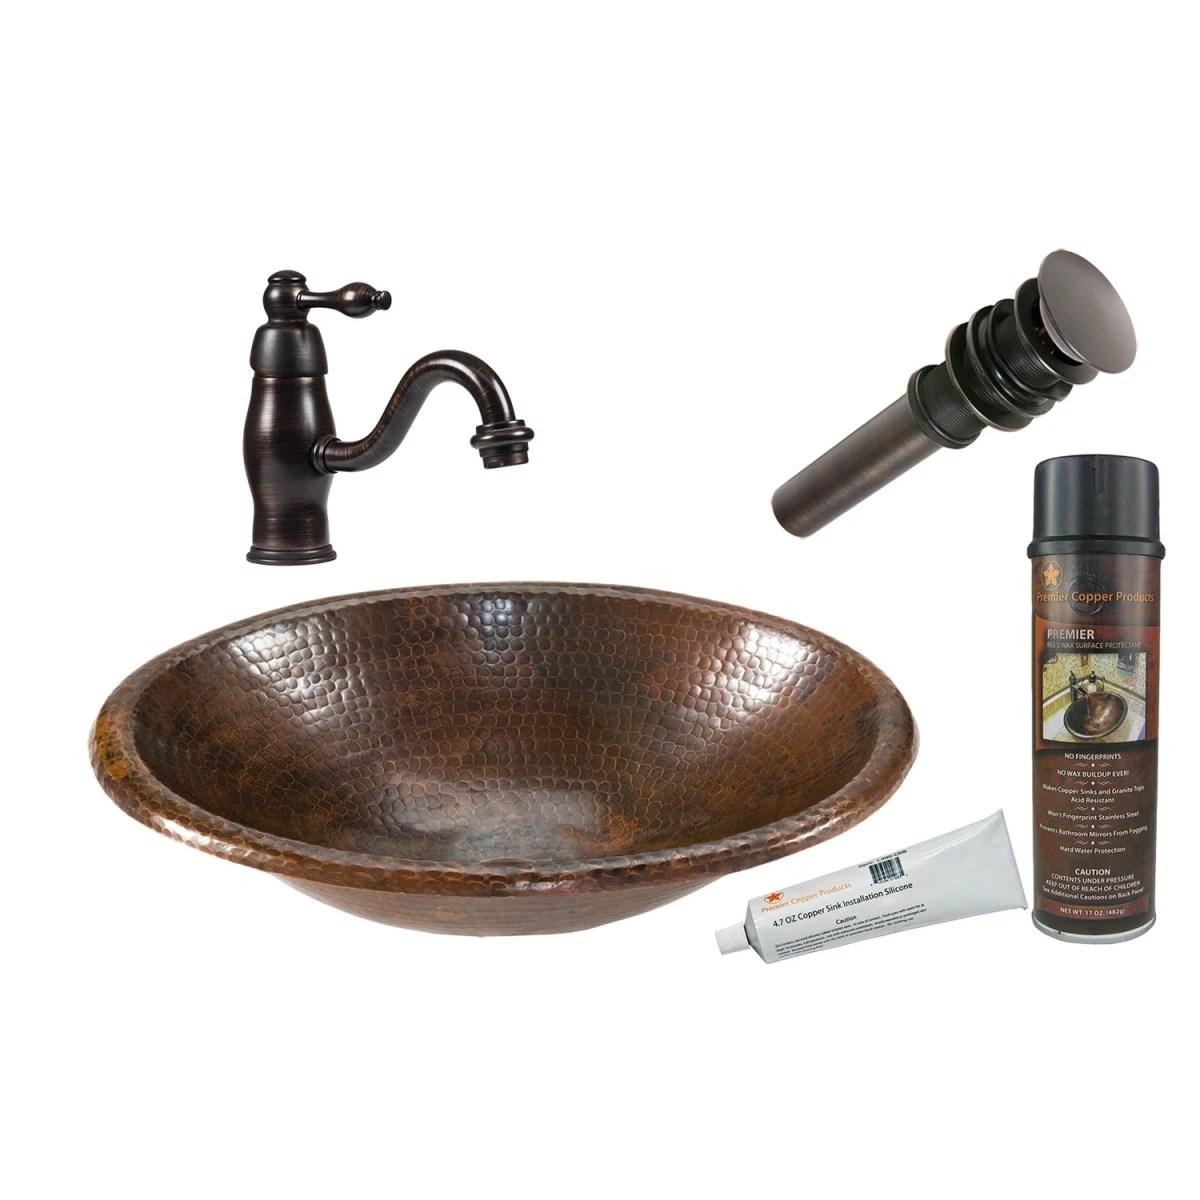 premier copper products bsp3 lo17rdb